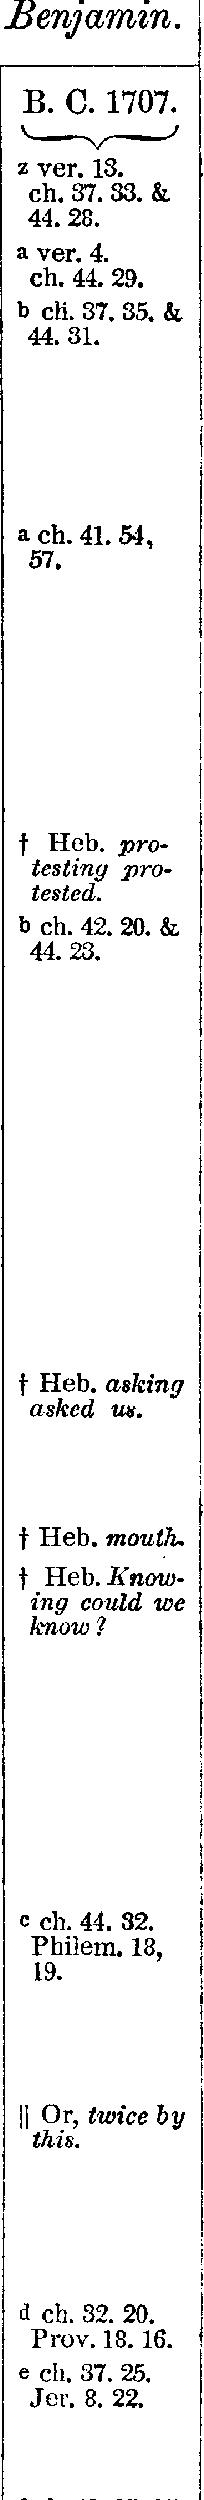 [merged small][merged small][ocr errors][merged small][ocr errors][merged small][merged small][merged small][merged small][merged small]